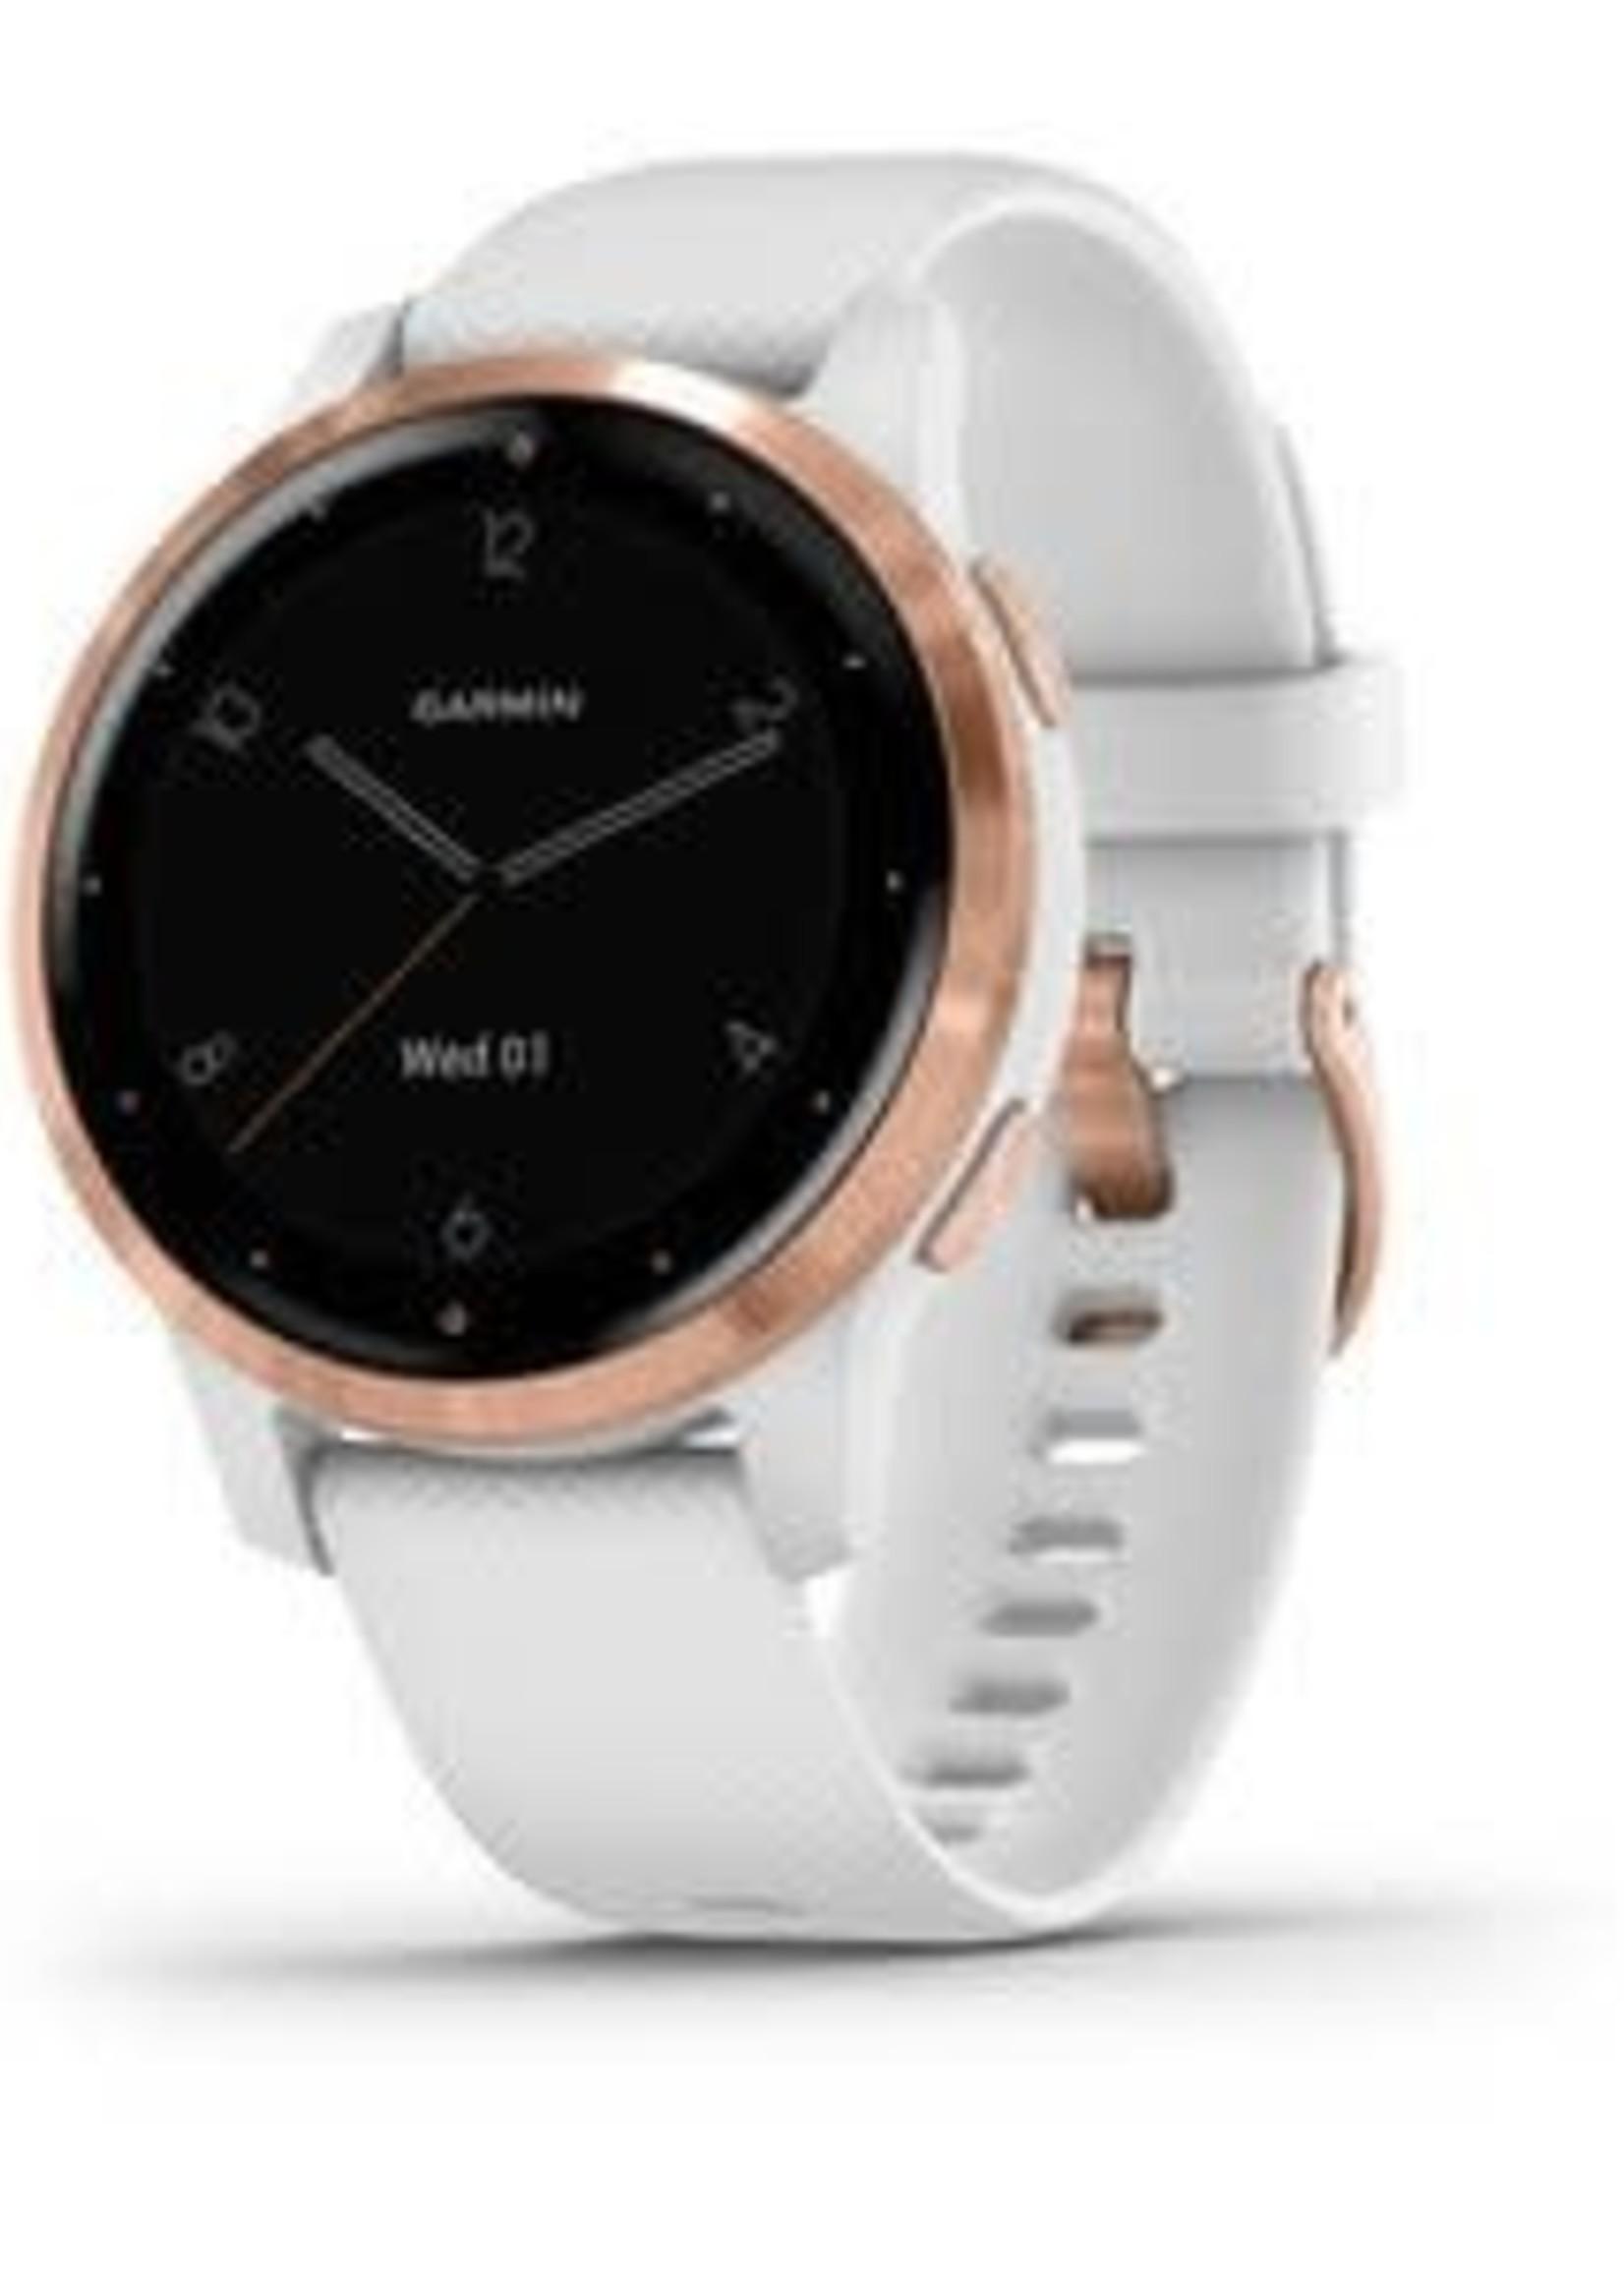 Garmin Garmin Watch Vivoactive, White/Rose Gold